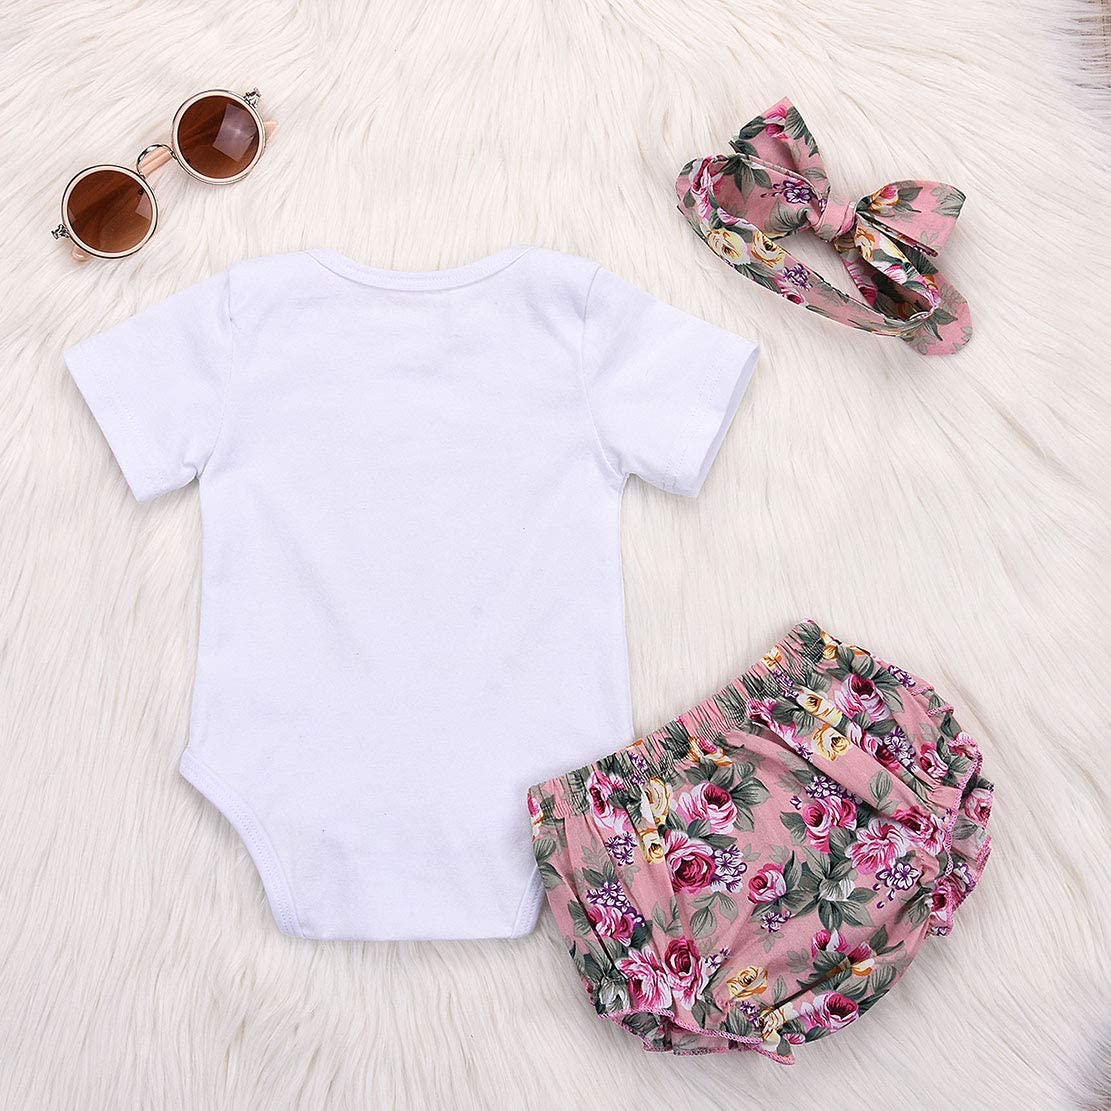 3 ST/ÜCKE Baby M/ädchen Kleidung Set Neugeborenes Kleid Prinzessin Outfits Strampler+Shorts+Stirnband f/ür Papa Mama Fathers Day